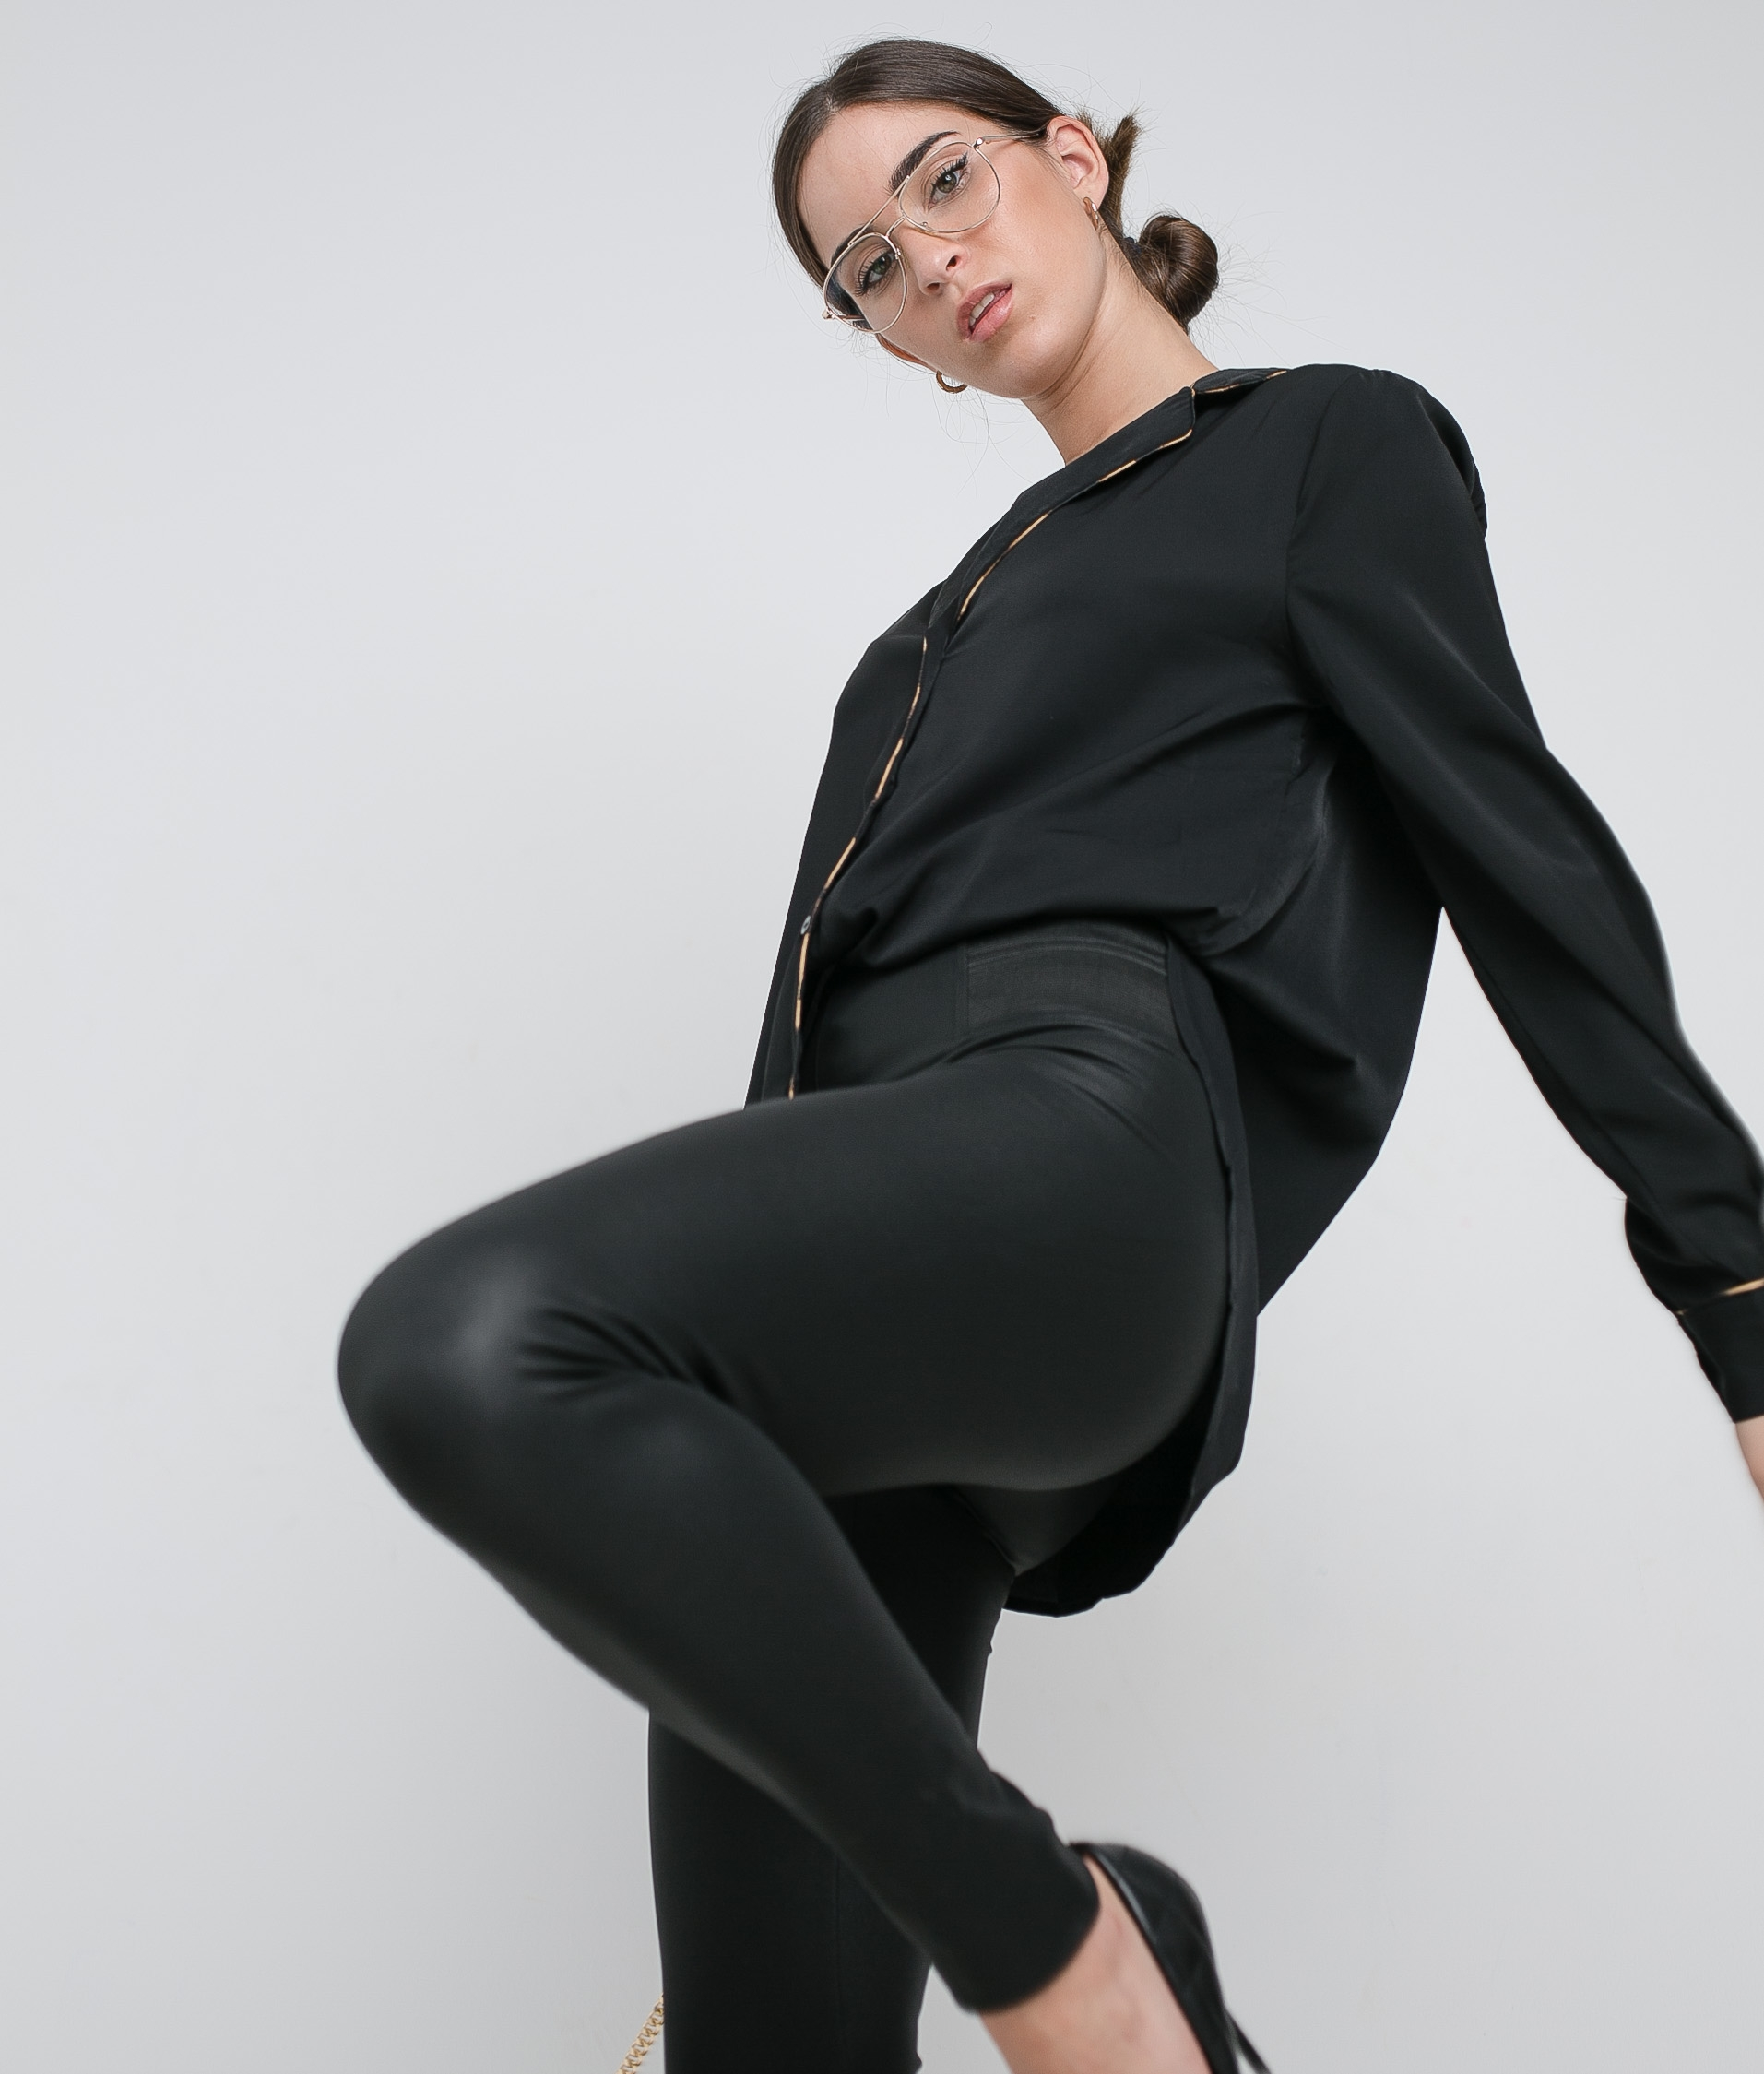 XAMILEI SHIRT - BLACK